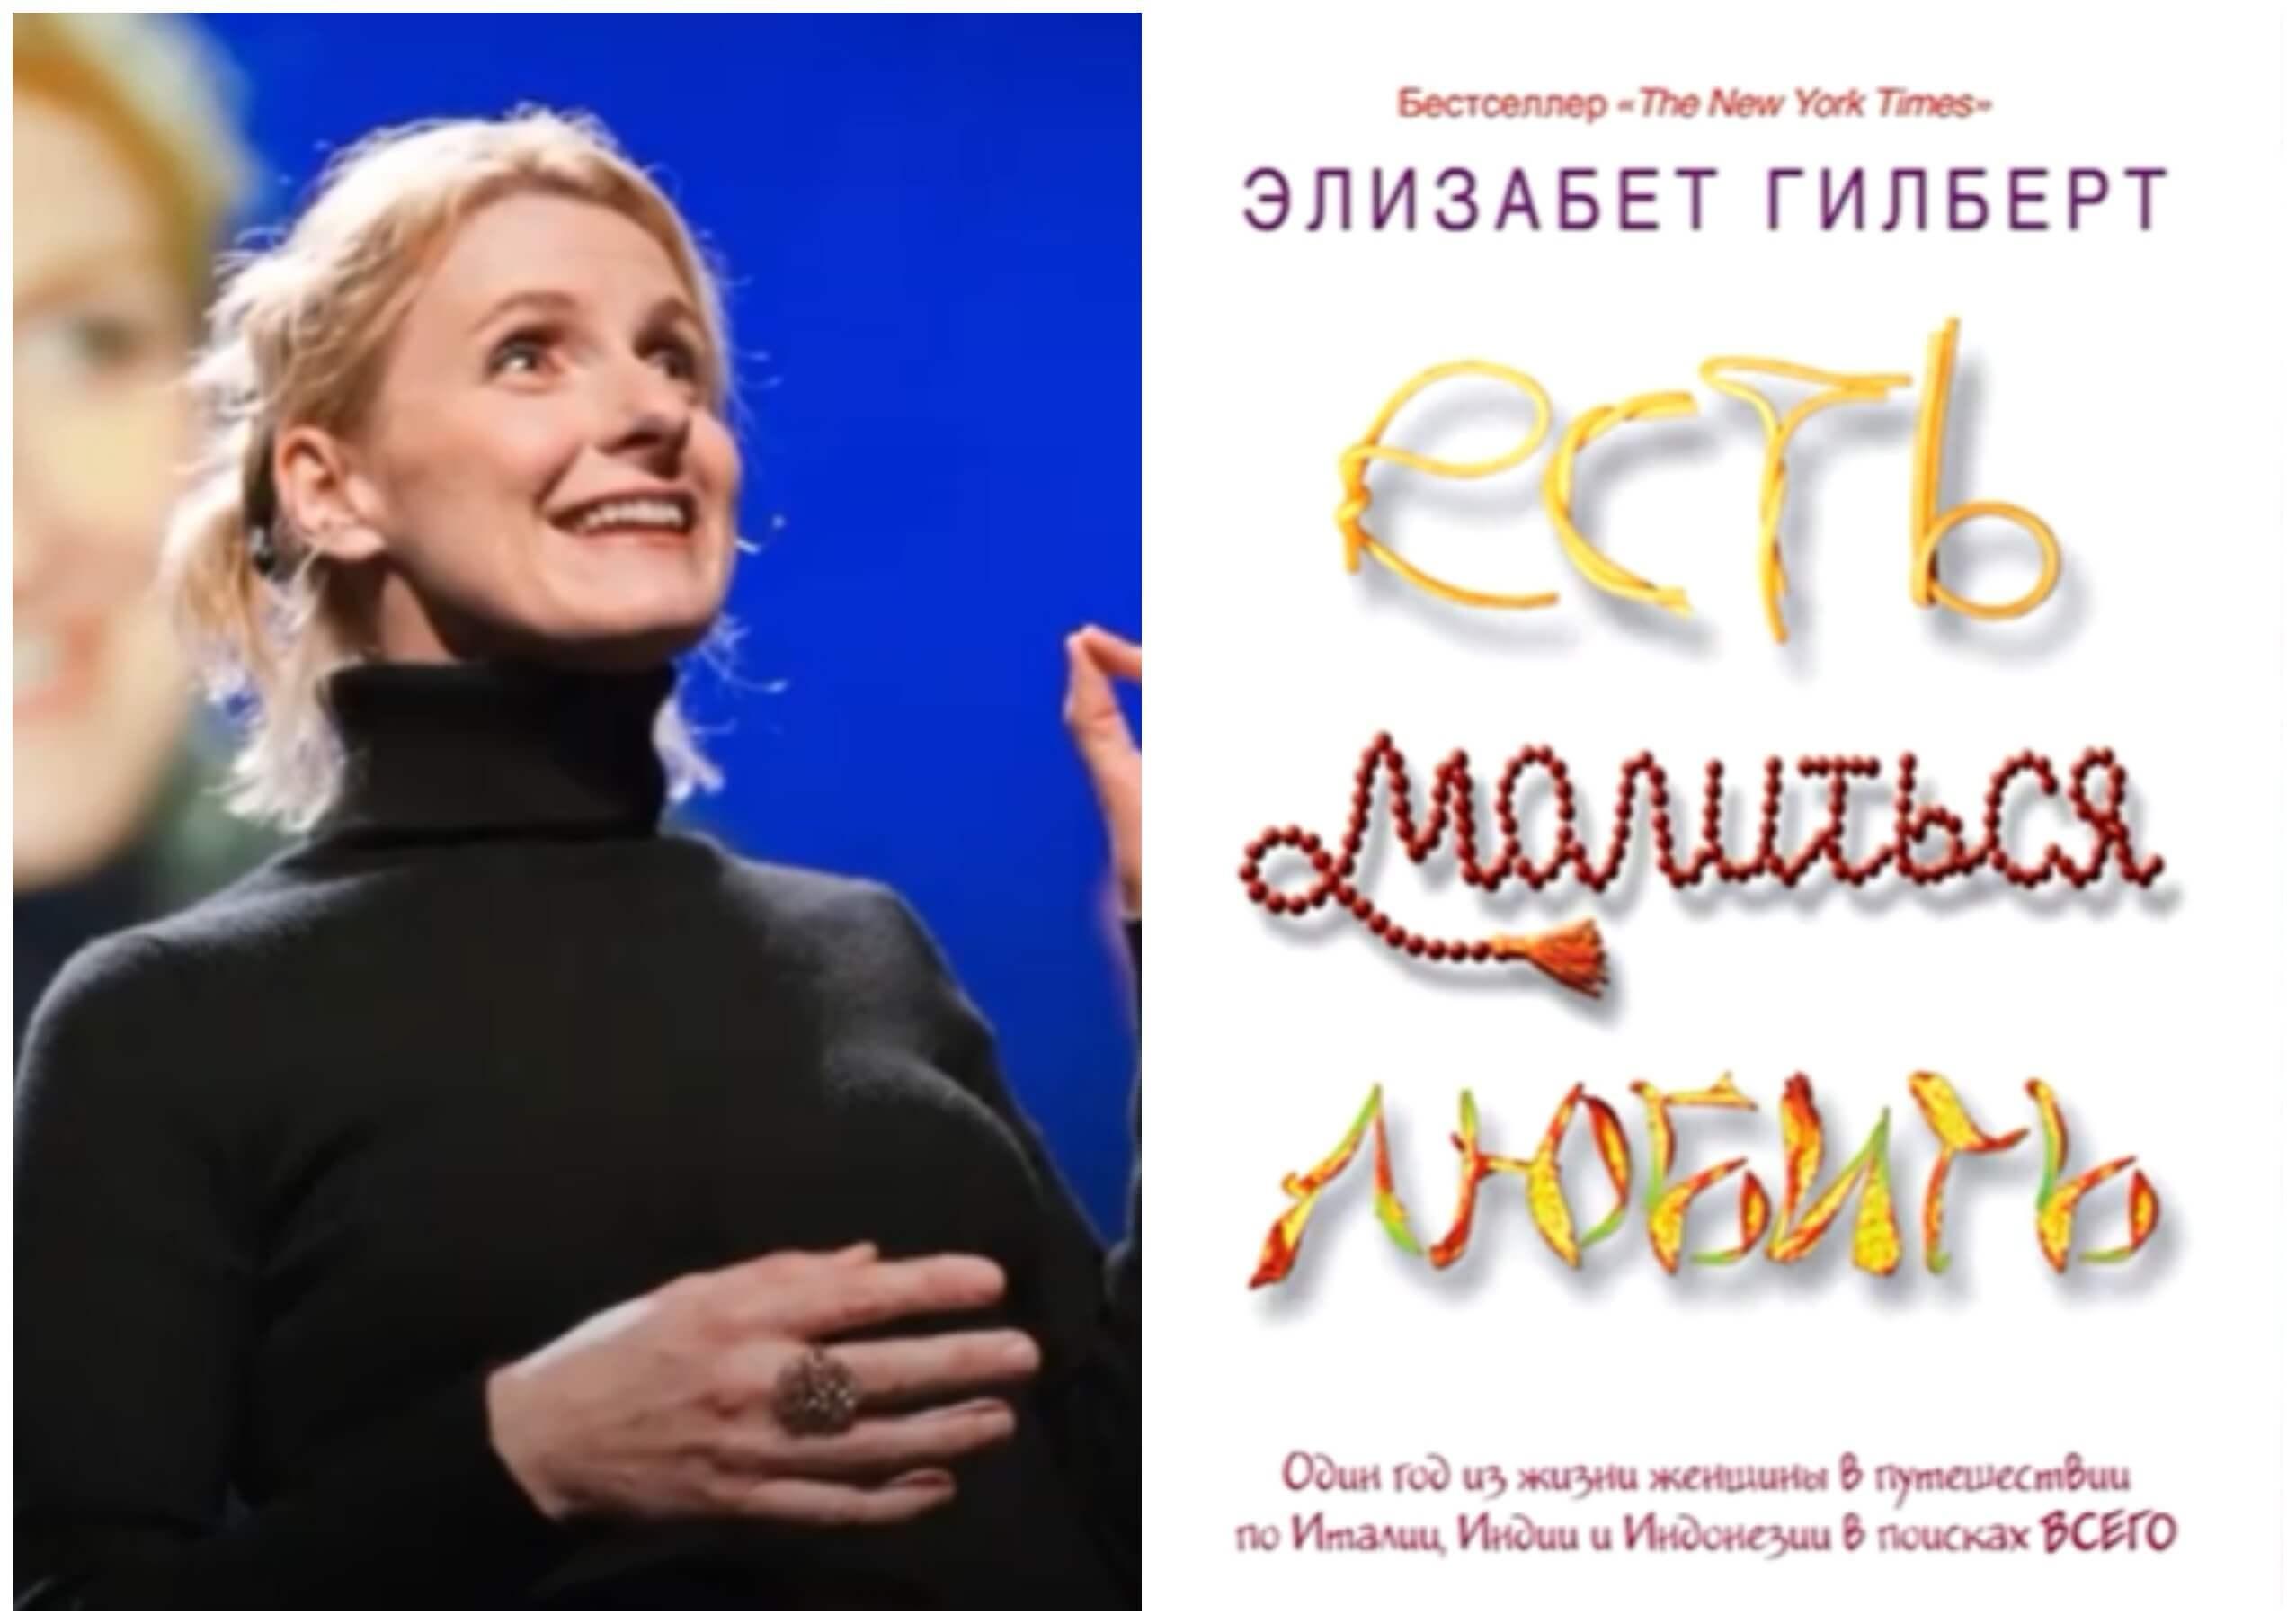 "На фото изображена элизабет гилюберт и обложка ее книги ""Ешь молись люби""."